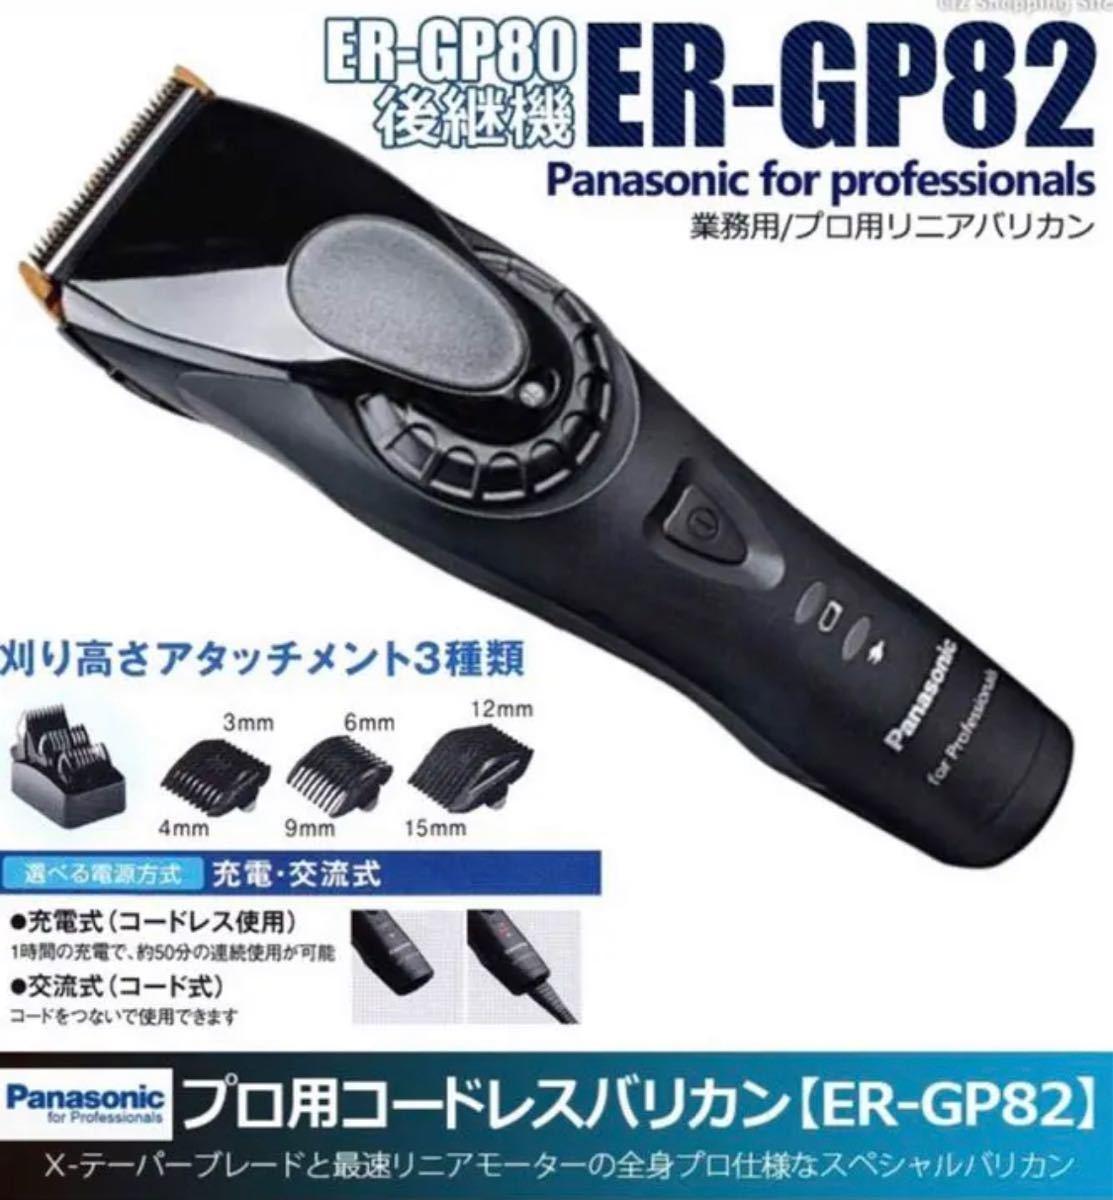 Panasonic パナソニック 業務用 充電式 ER.-GP82 バリカン GP80後継機